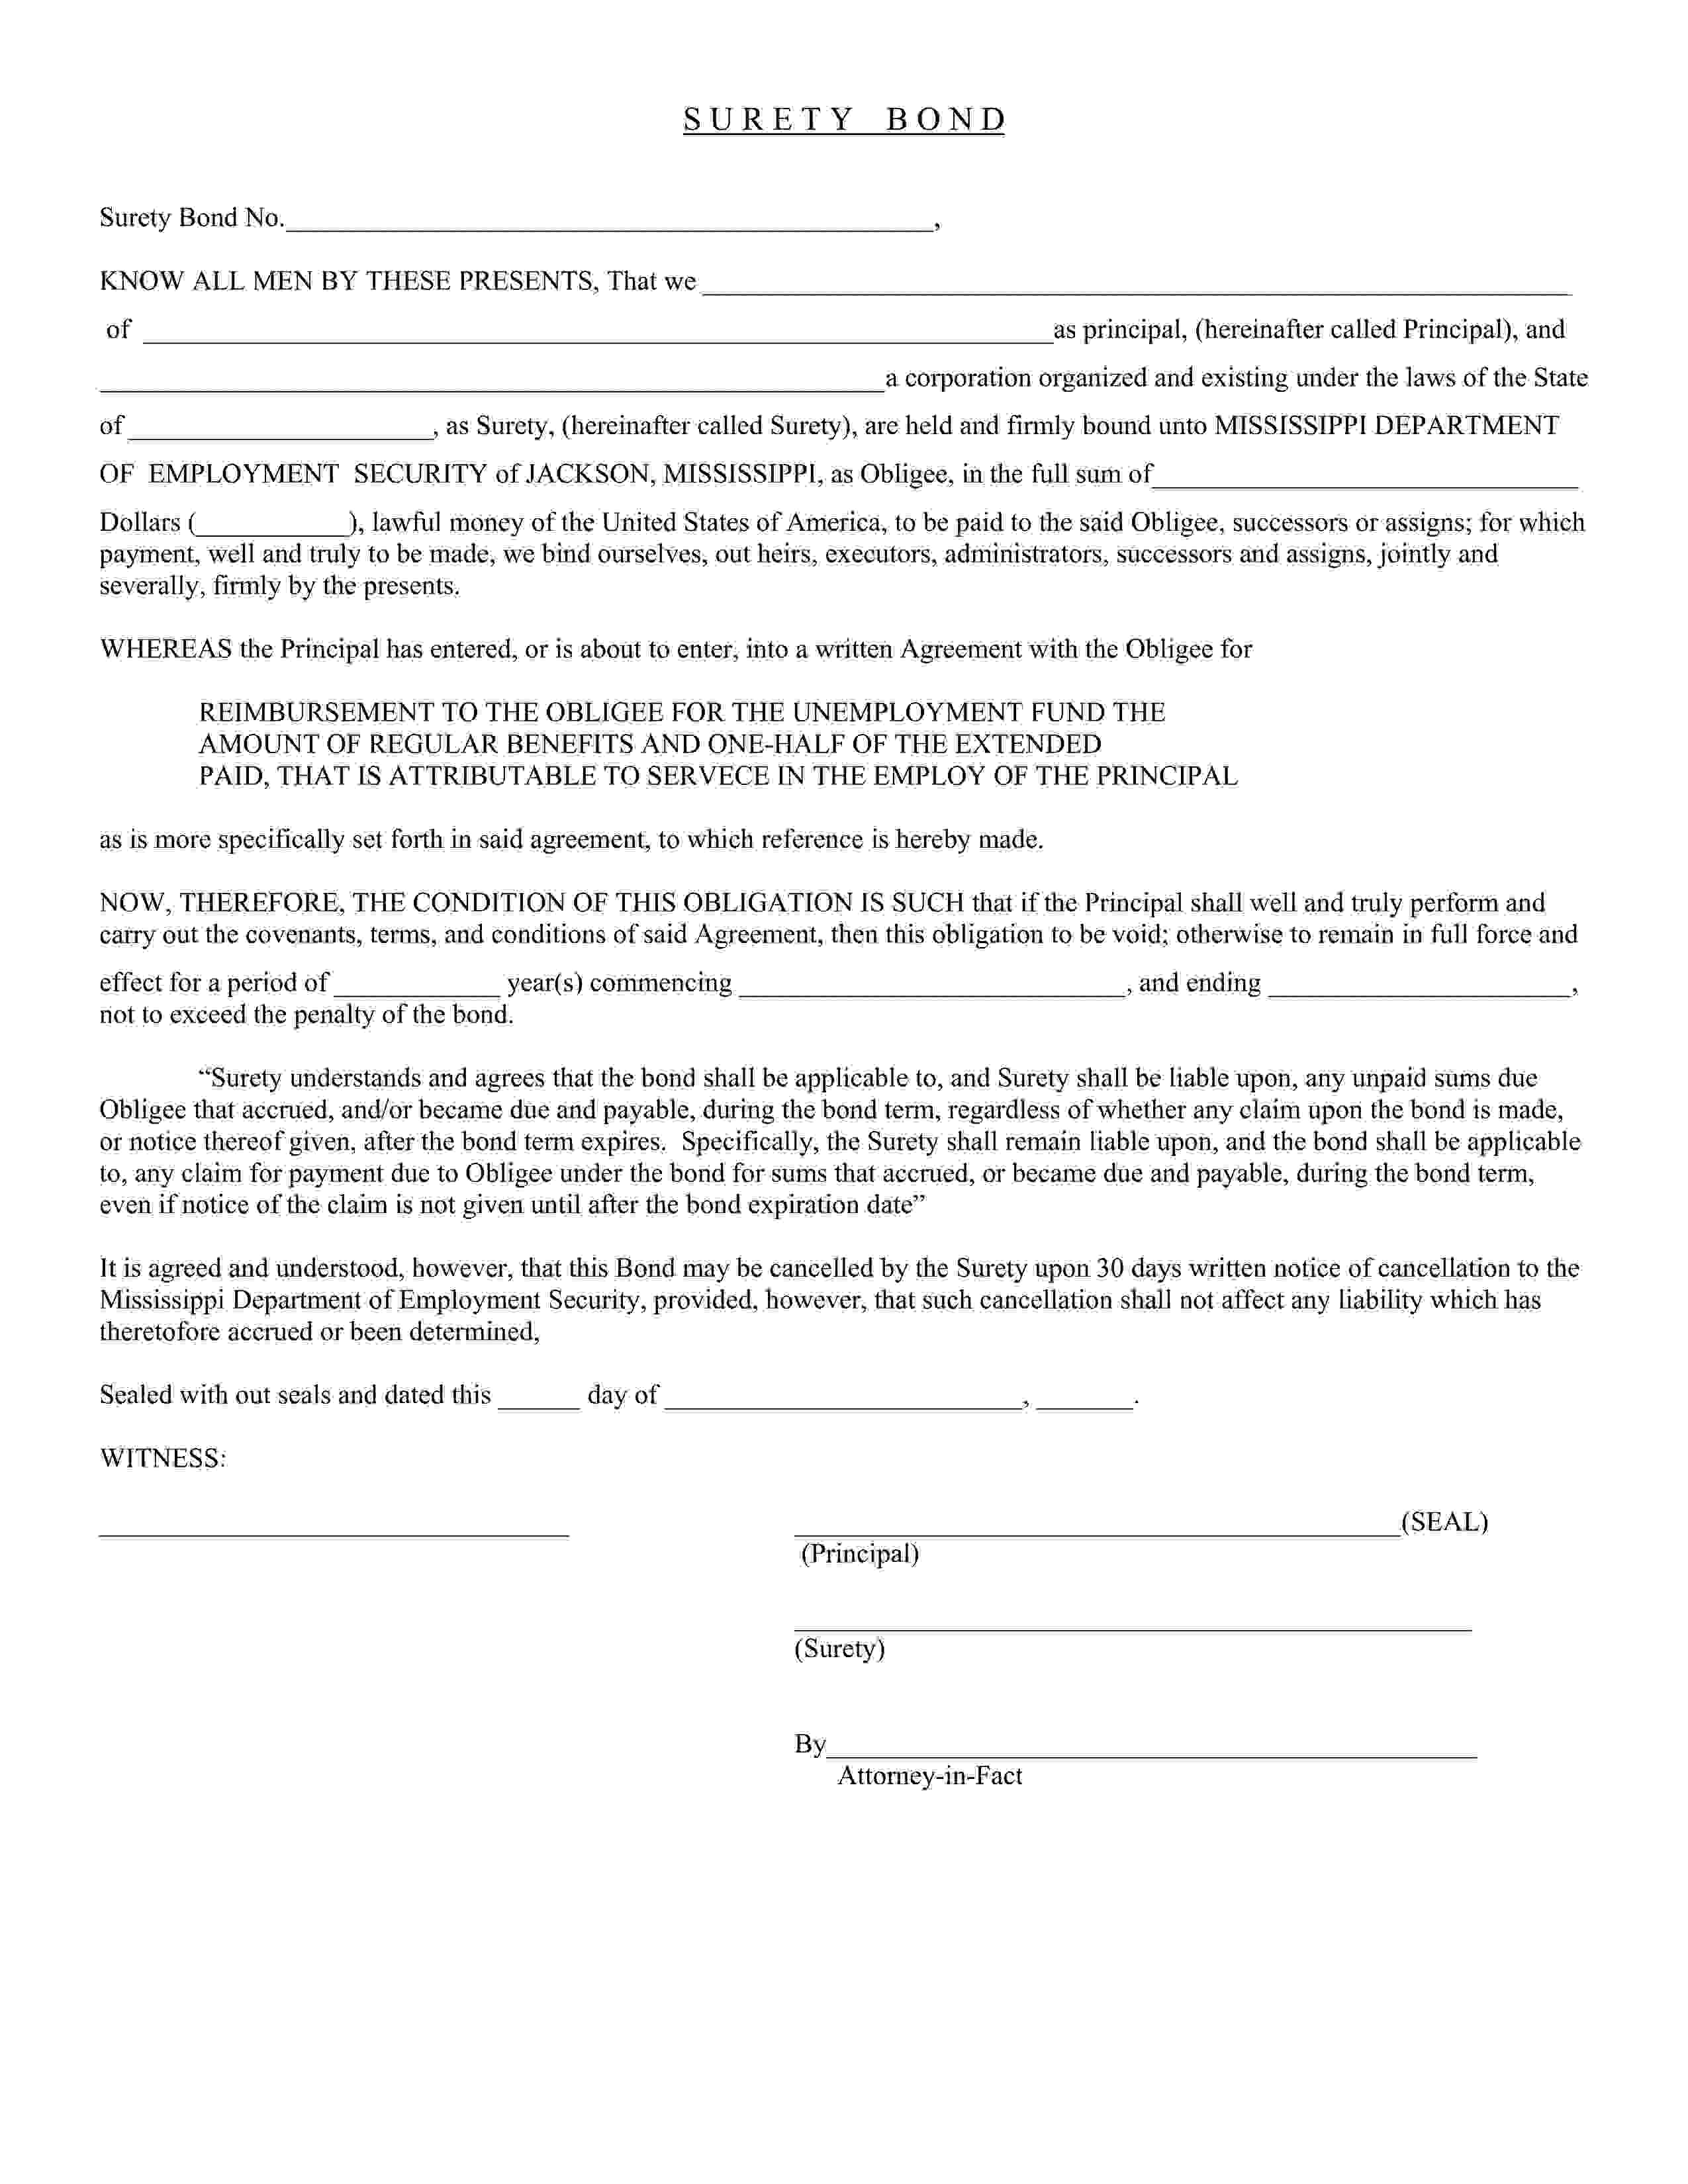 Mississippi Department of Employment Security Reimbursing Employer (Unemployment Tax) Bond sample image